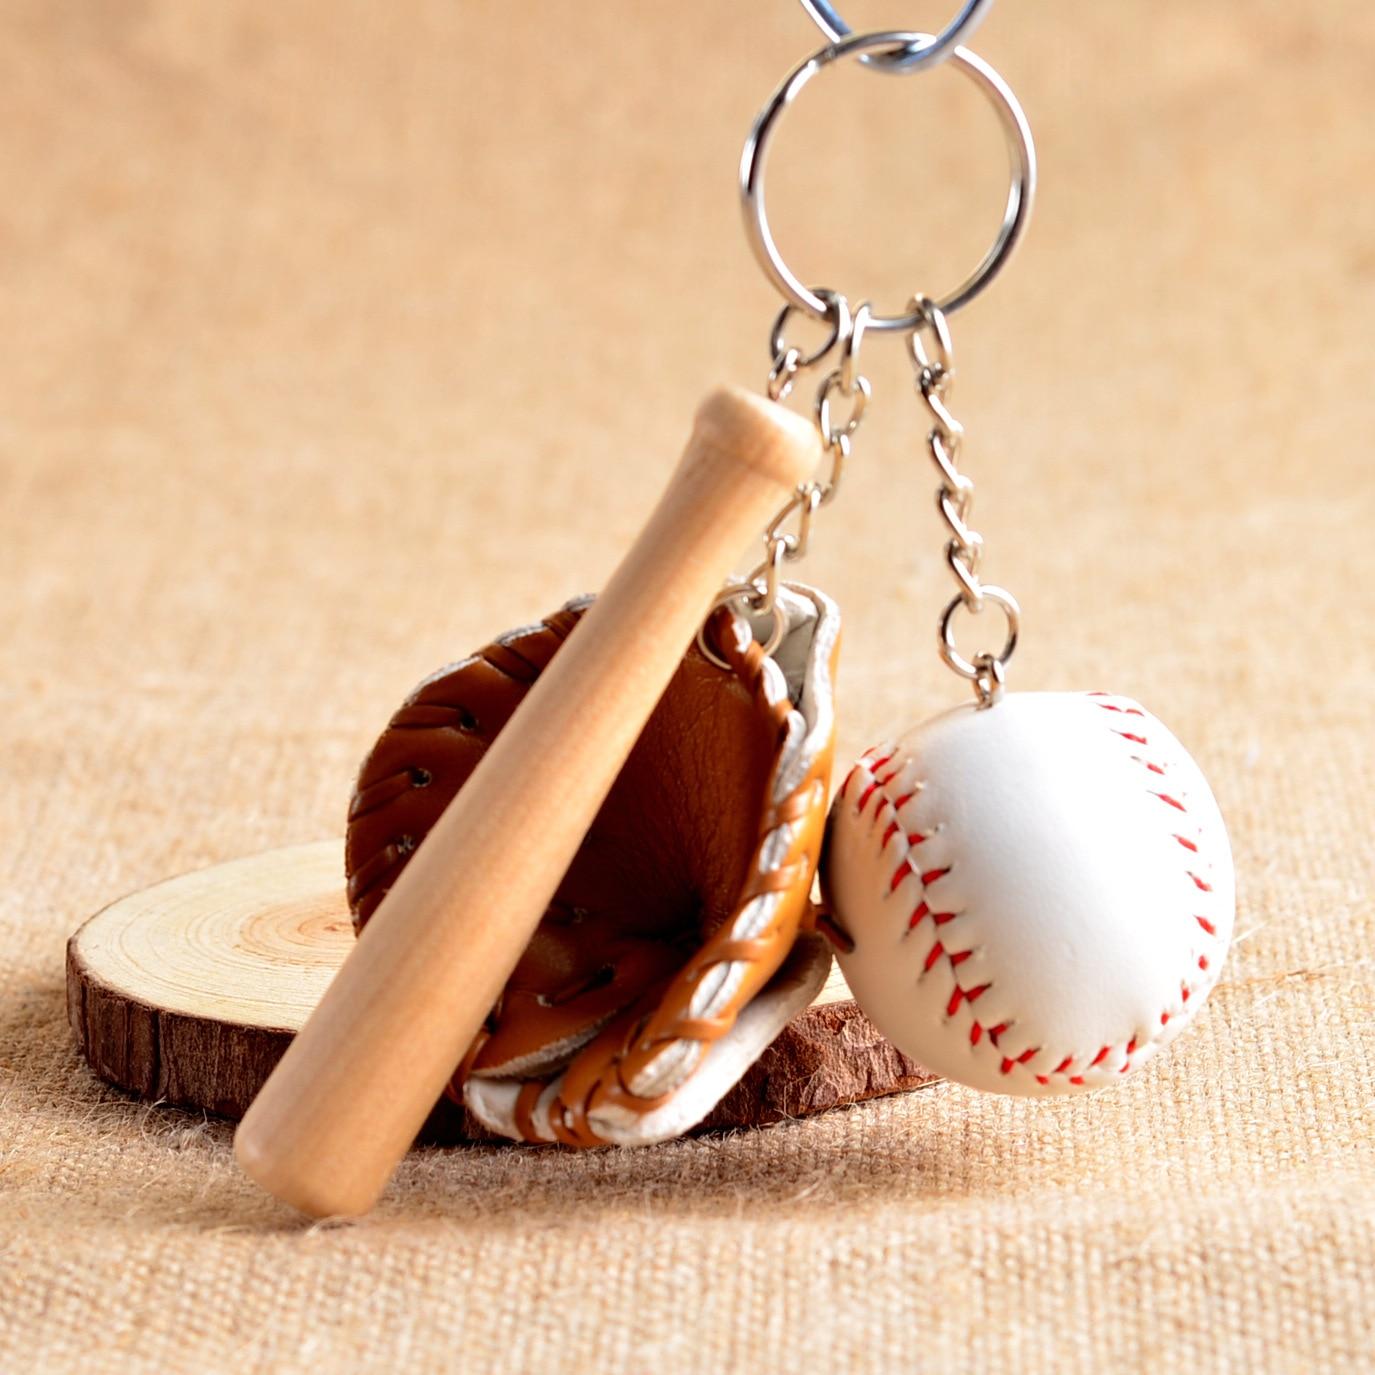 Mini Three Piece Baseball Glove Wooden Bat Keychain Sports